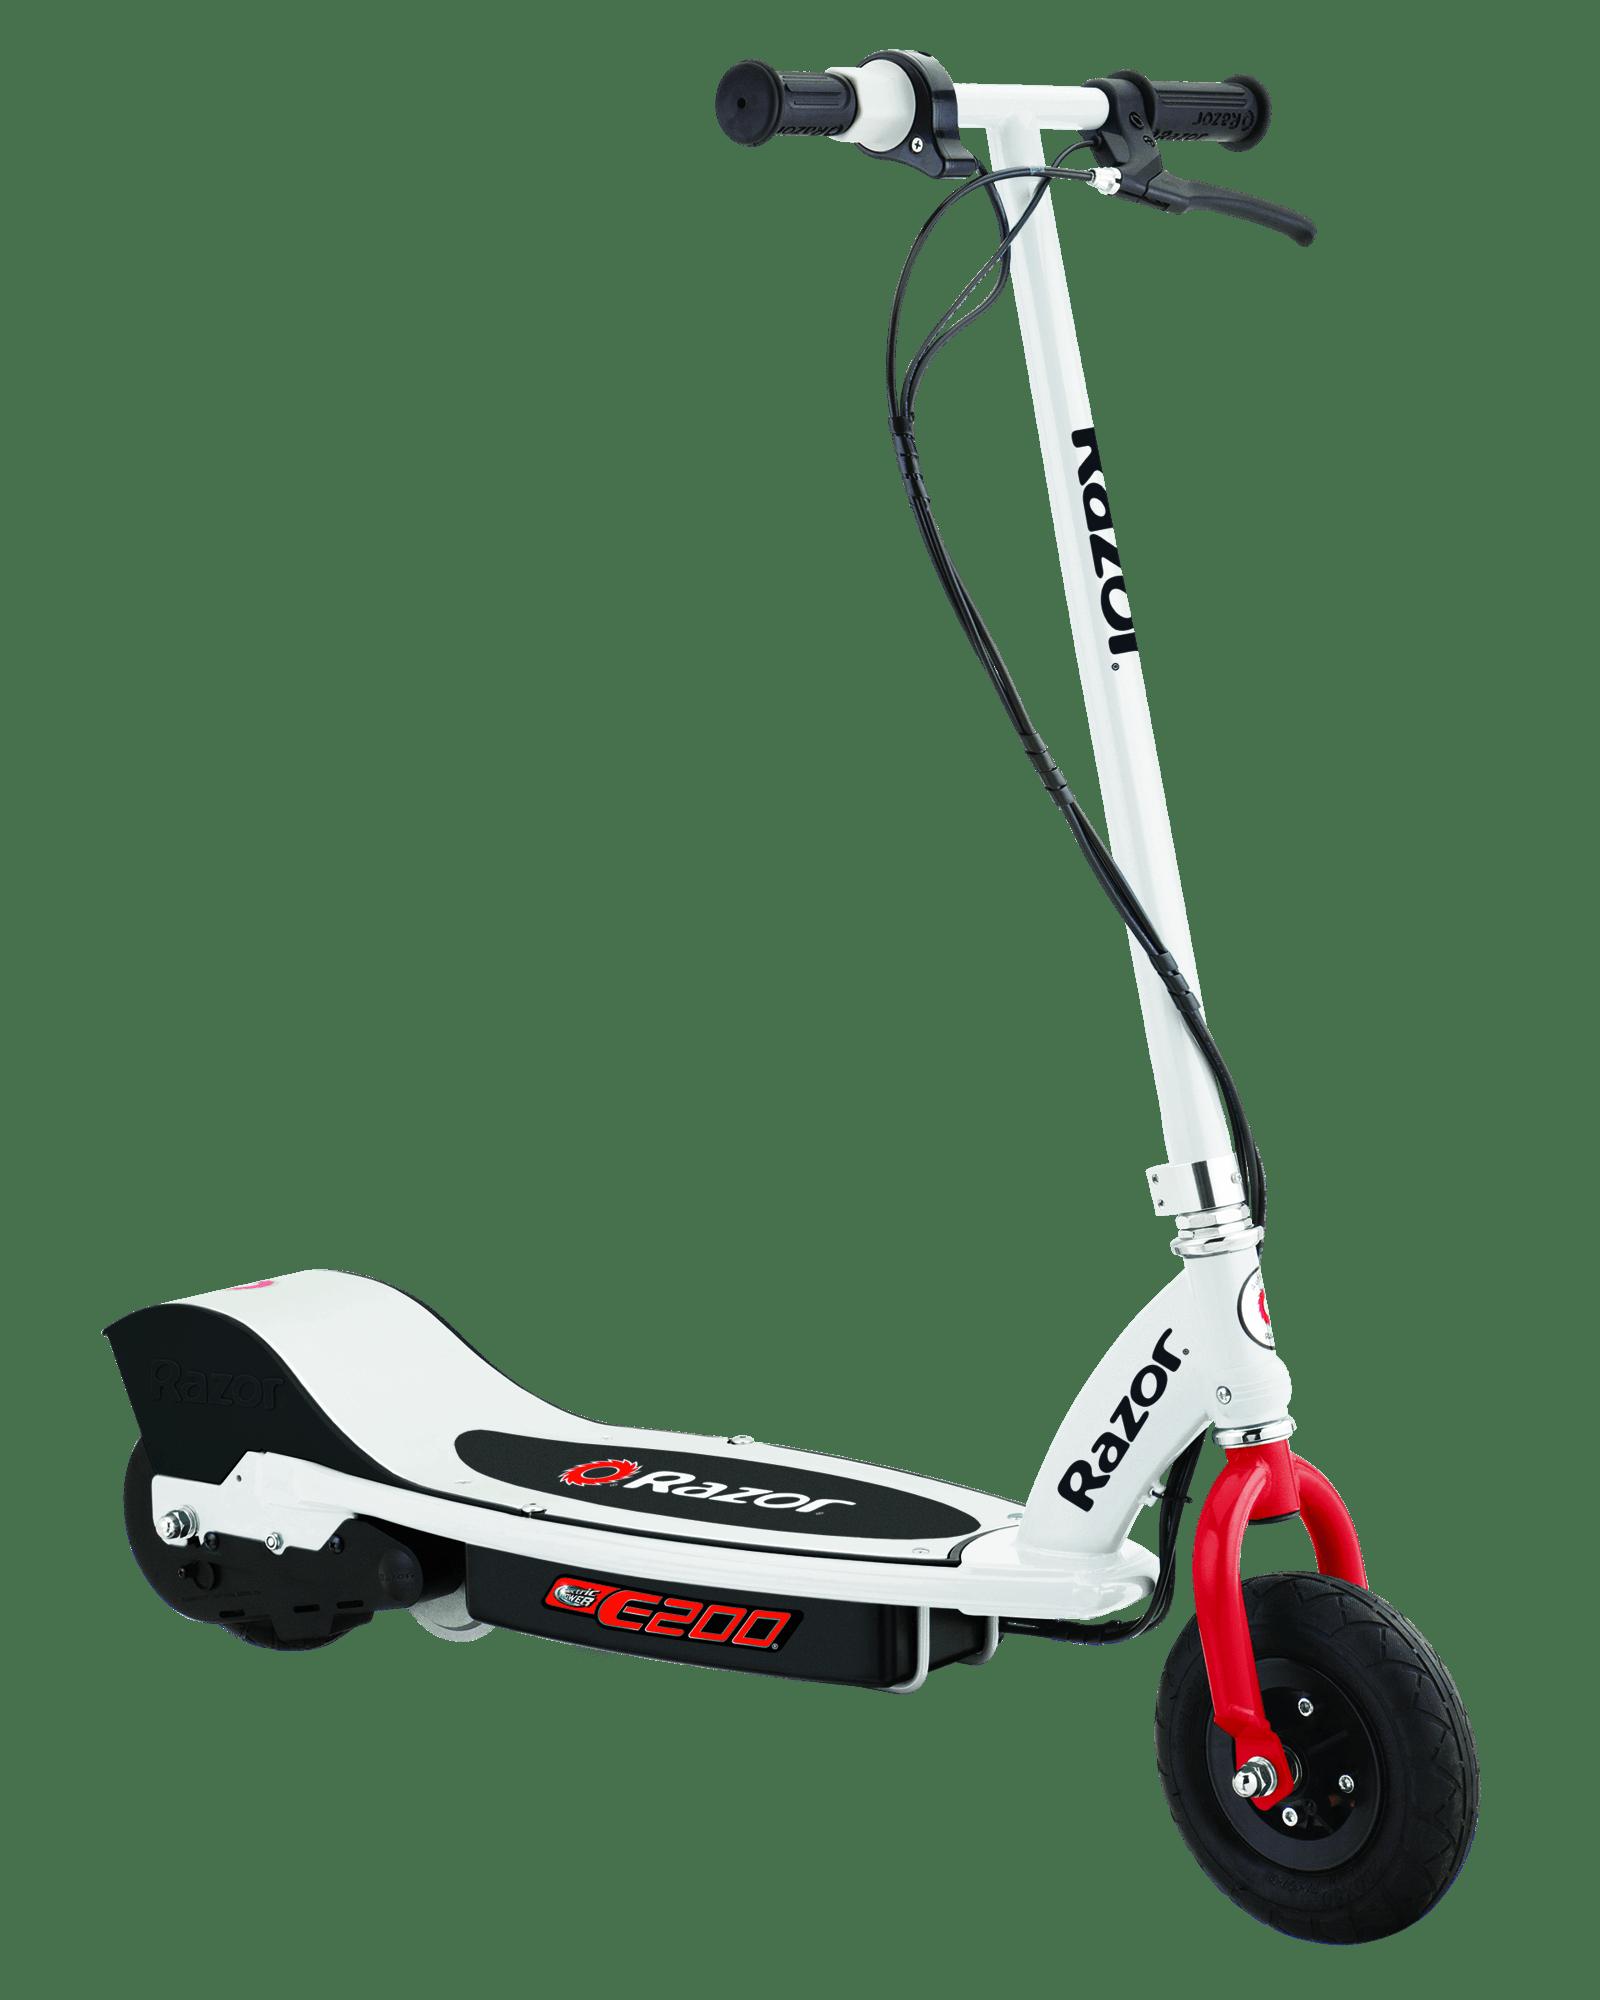 hight resolution of e200 electric scooter razor razor e200 battery wiring diagram